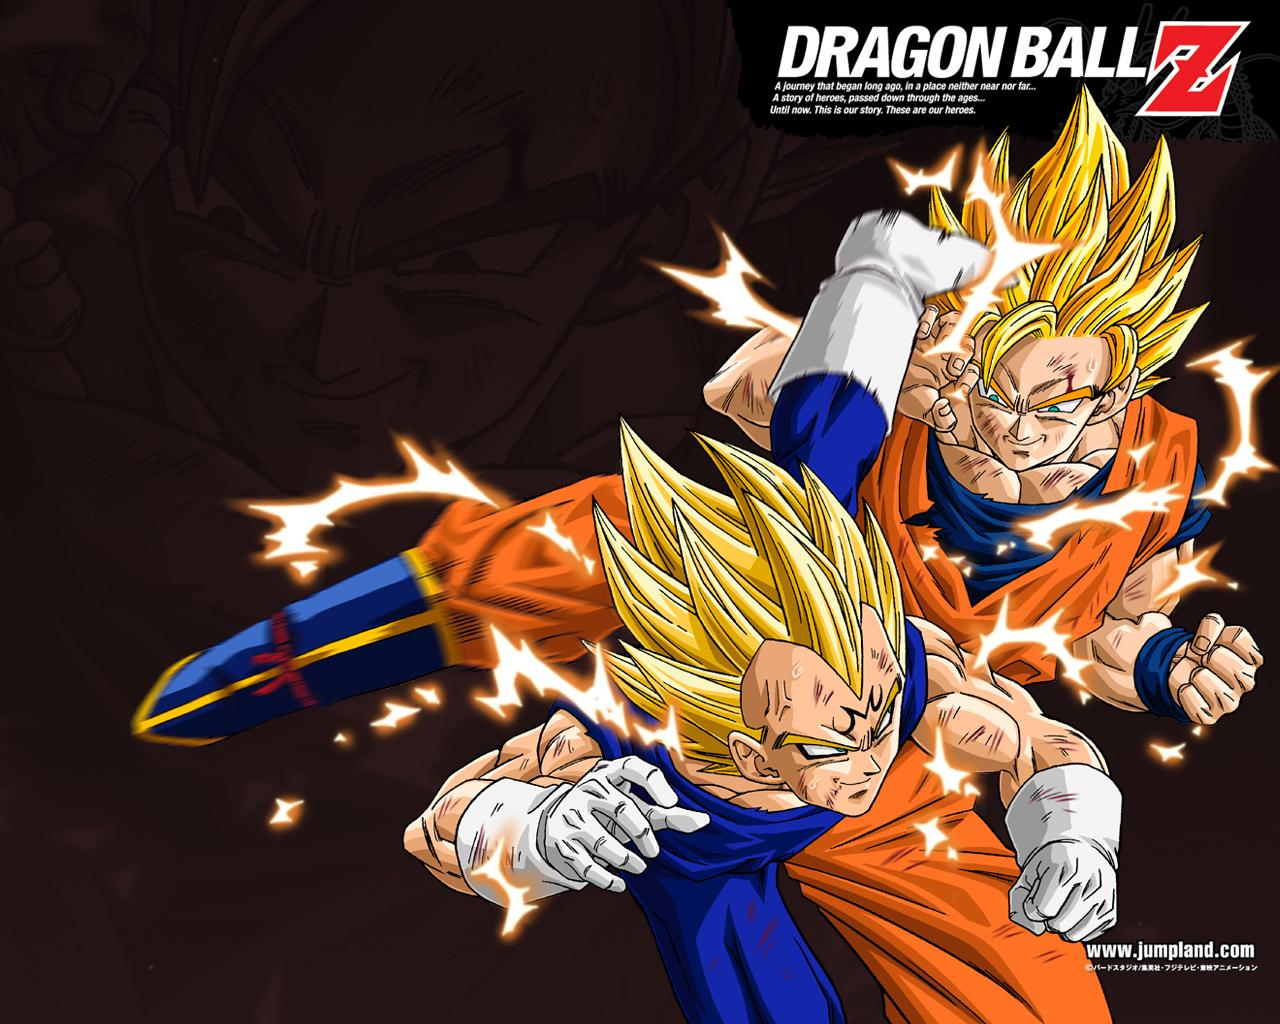 Dragon Ball Dbz Goku Majin Vegeta HD Wallpaper 1280x1024